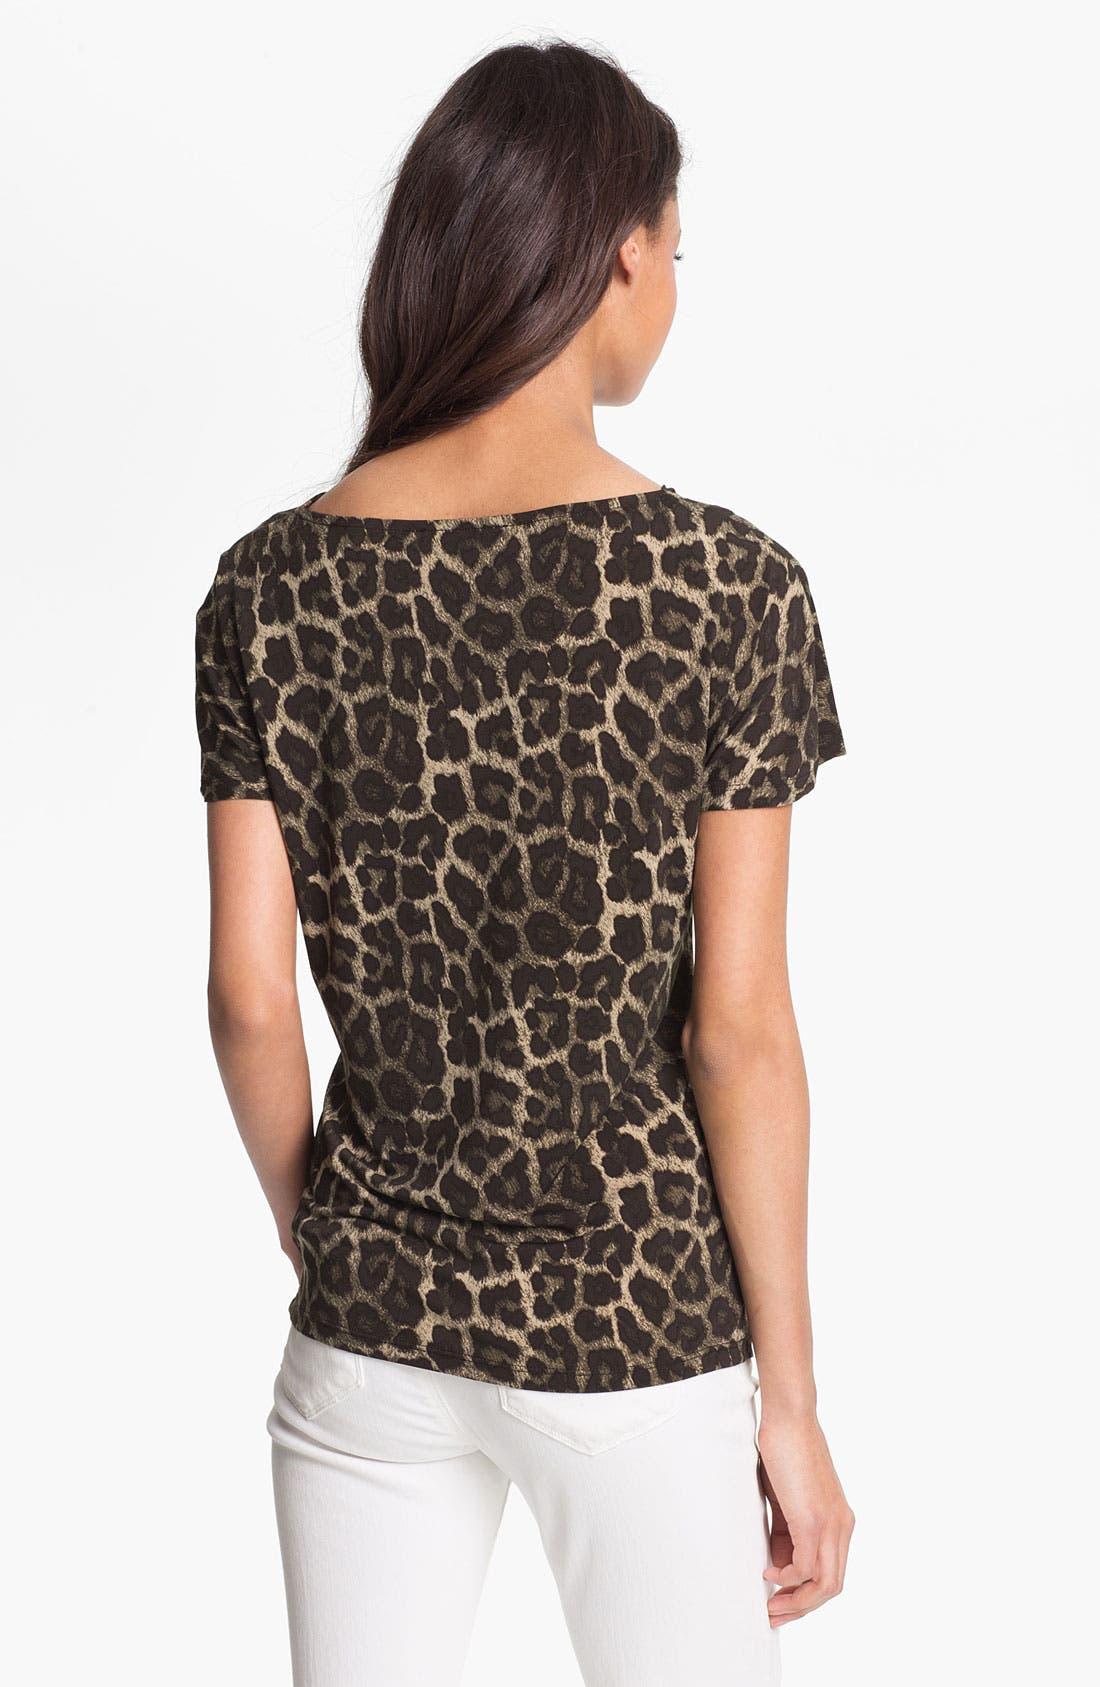 Alternate Image 2  - MICHAEL Michael Kors 'Savannah' Leopard Print Top (Petite)